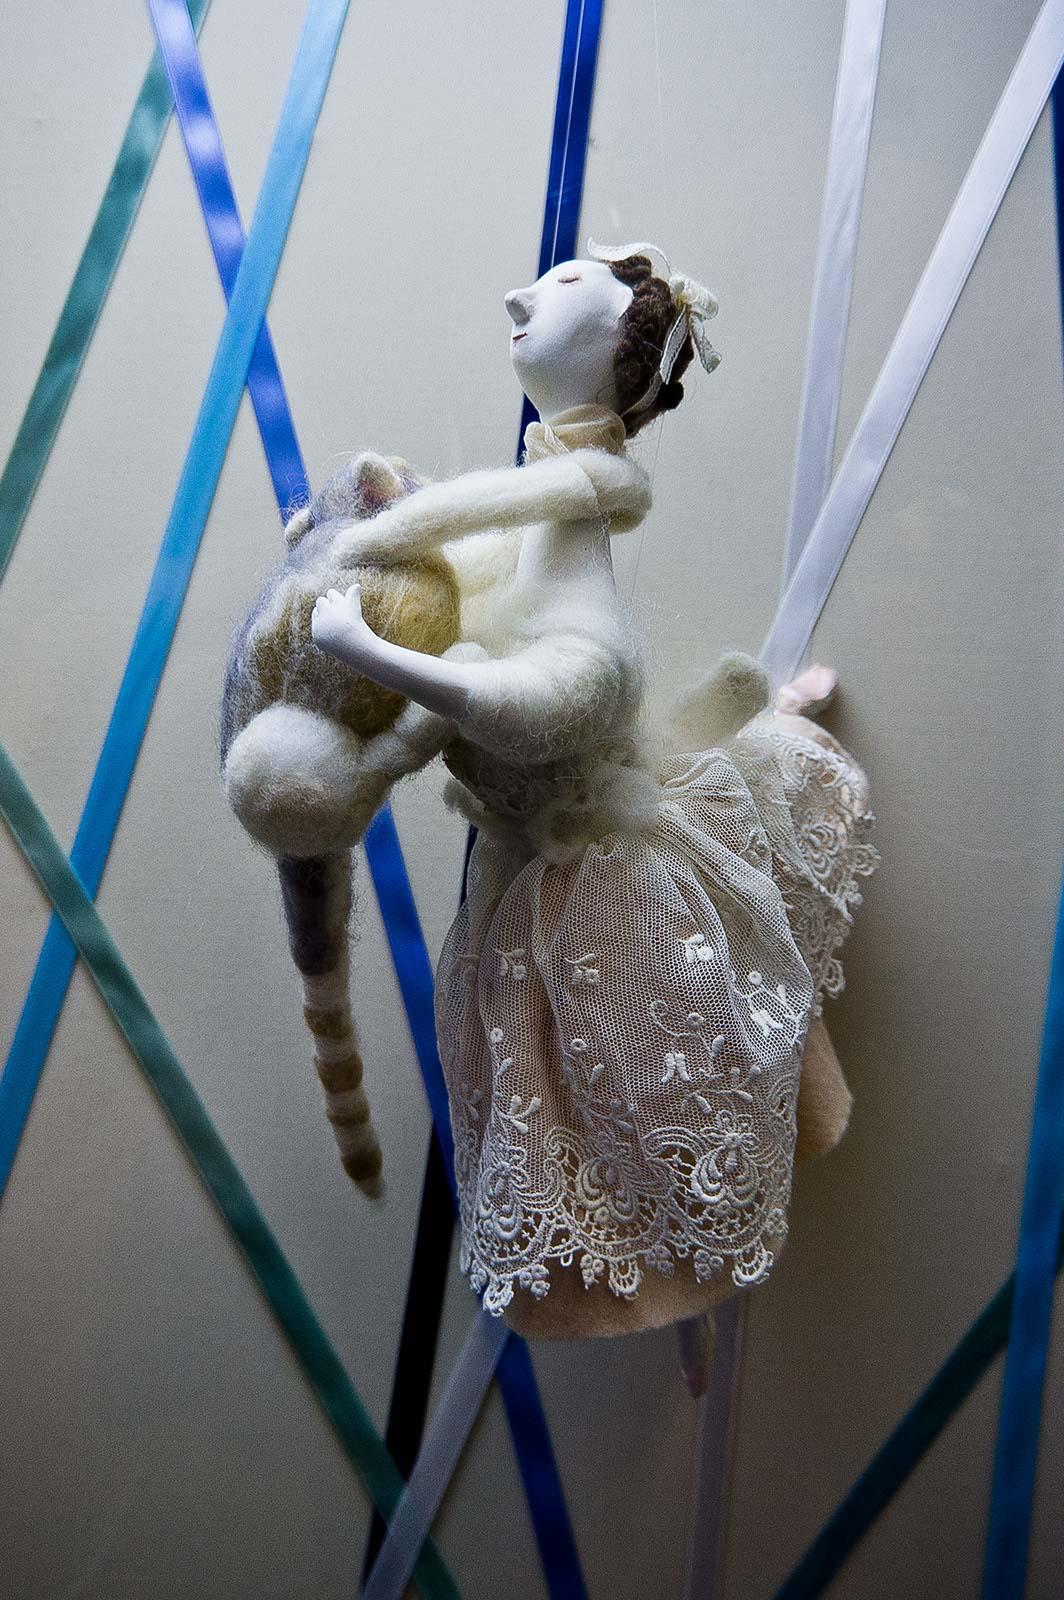 Фото №89621. Балерина с котом. Елена Ермолина